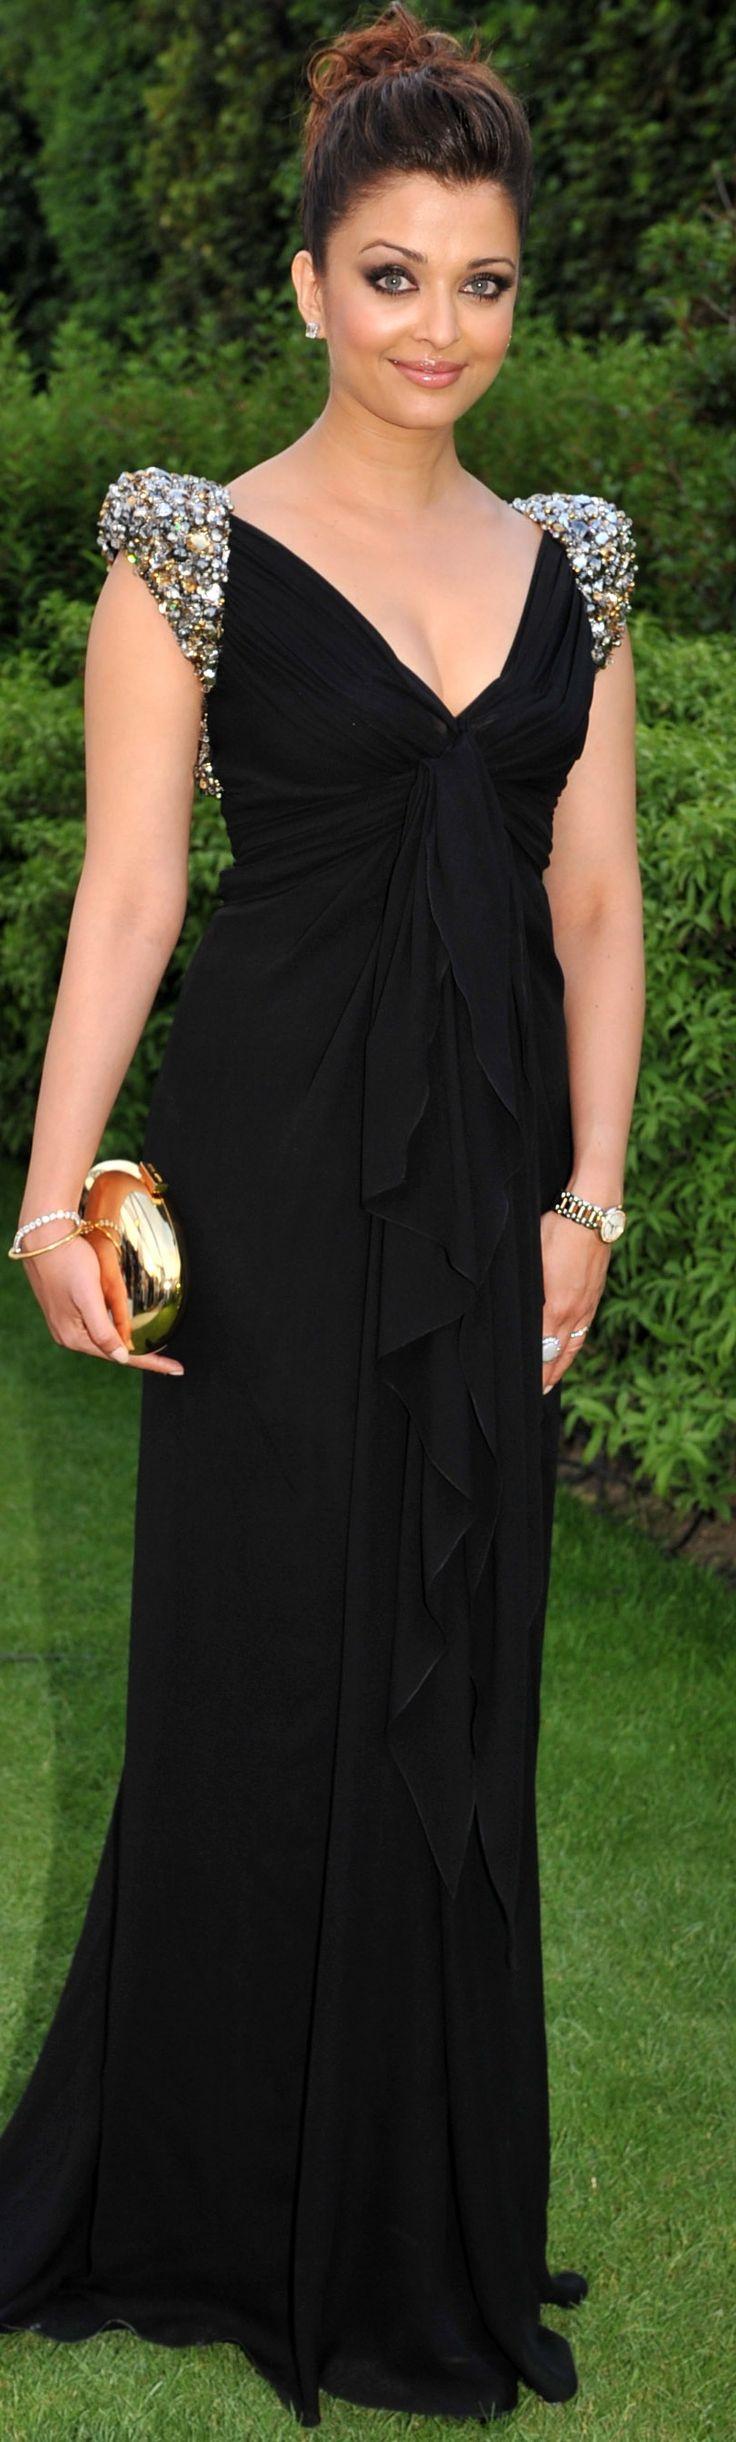 #Red Carpet @ #Cannes - Aishwarya Rai-Bachhan